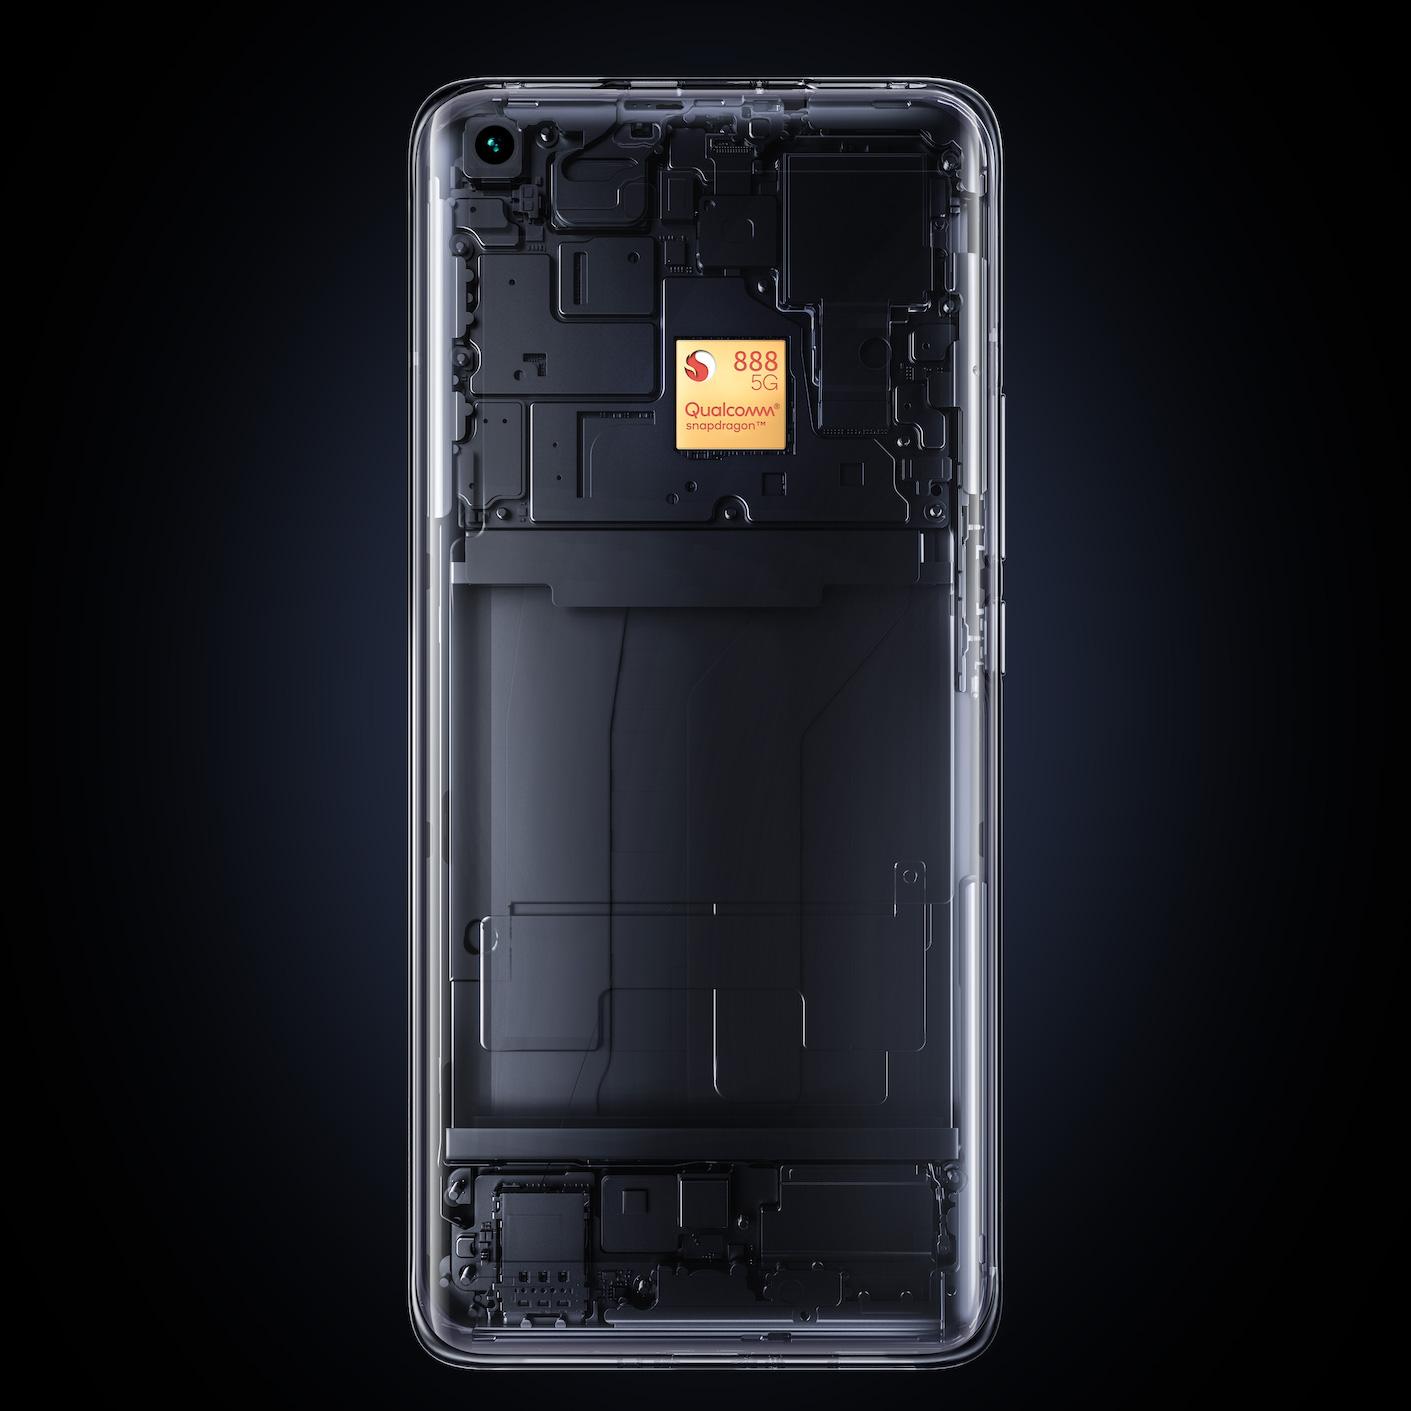 Xiaomi Mi 11 revealed Snapdragon 888